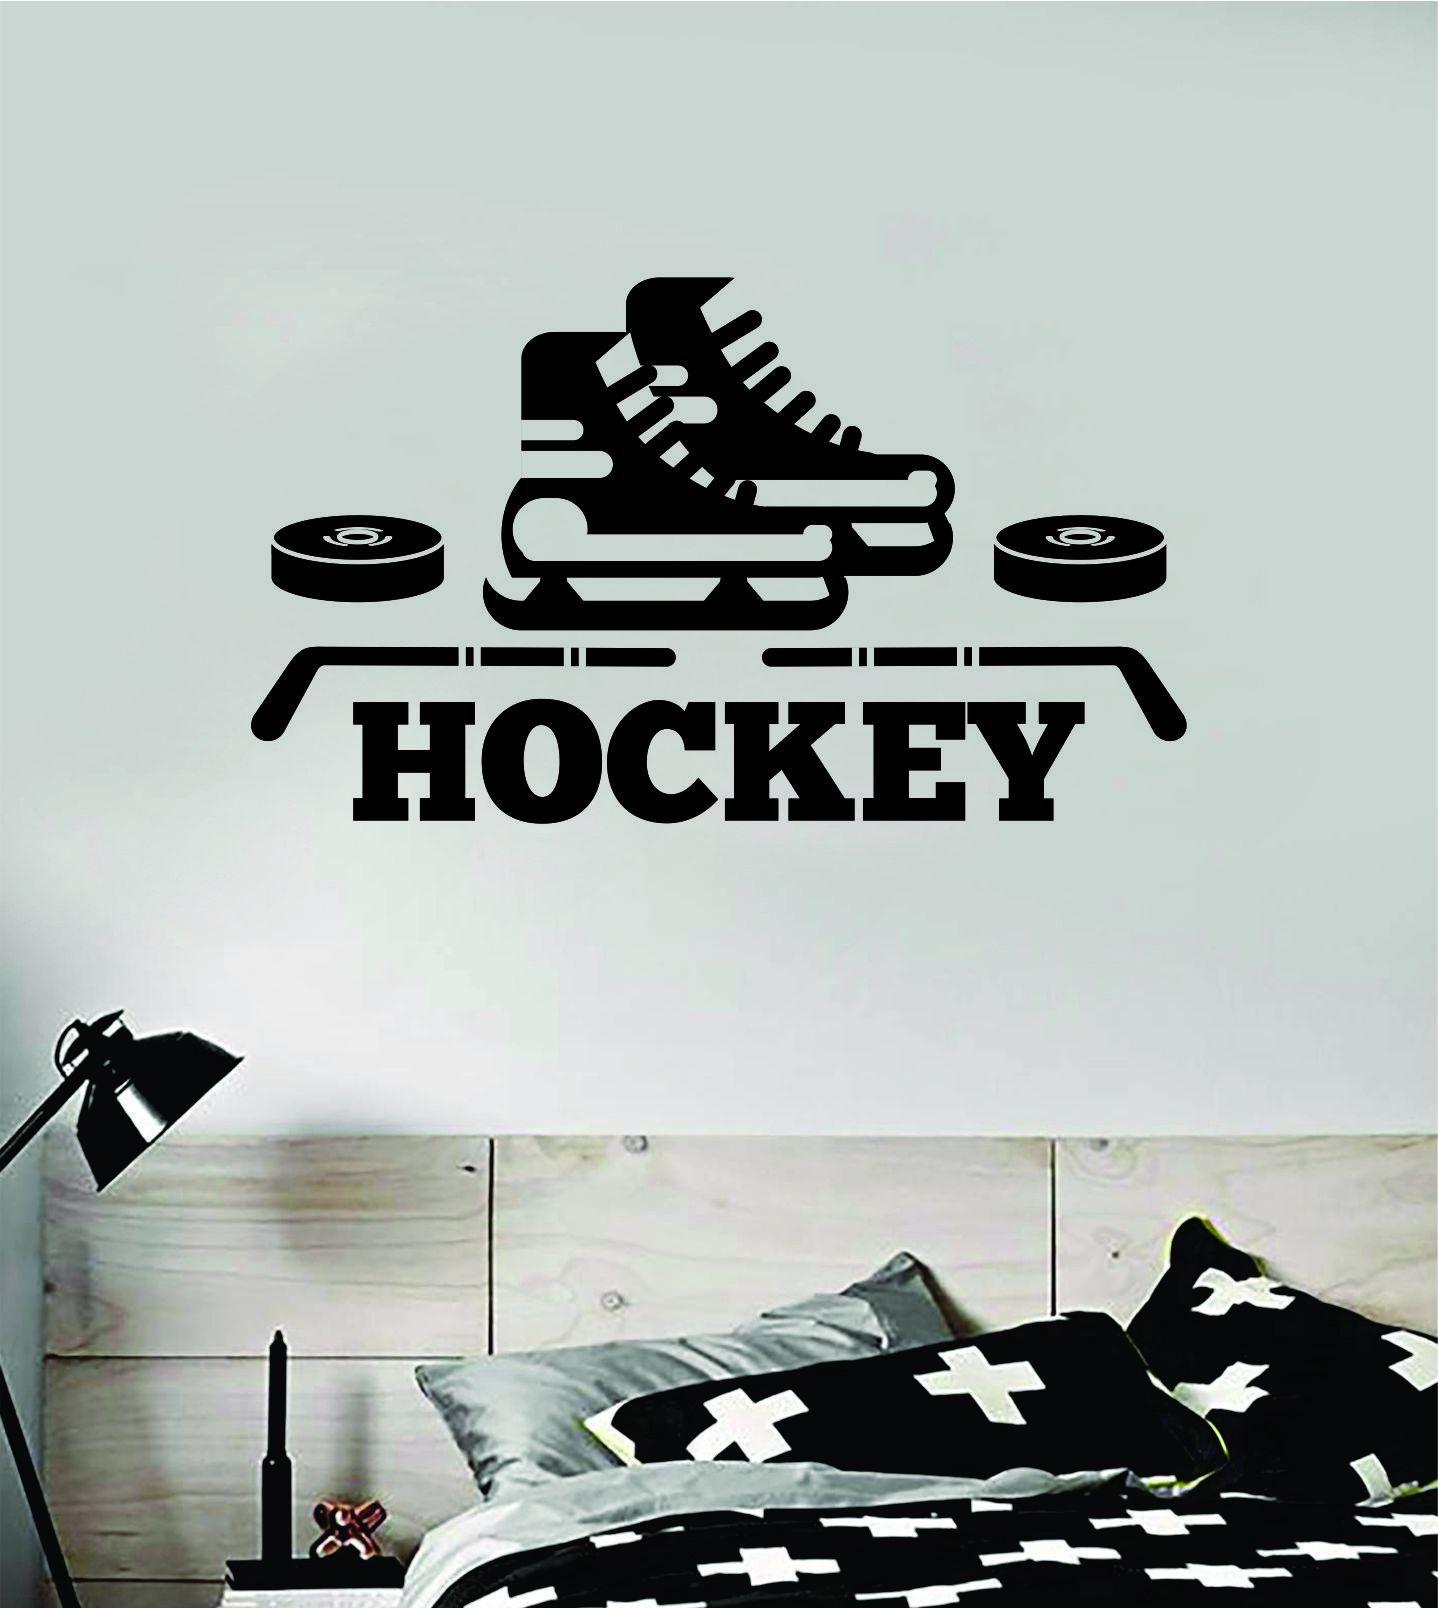 Hockey Wall Decal Sticker Vinyl Art Bedroom Room Home Decor Quote Kids Teen Baby Boy Girl Nursery Ice Skate Puck Stick NHL Winter - saphire blue